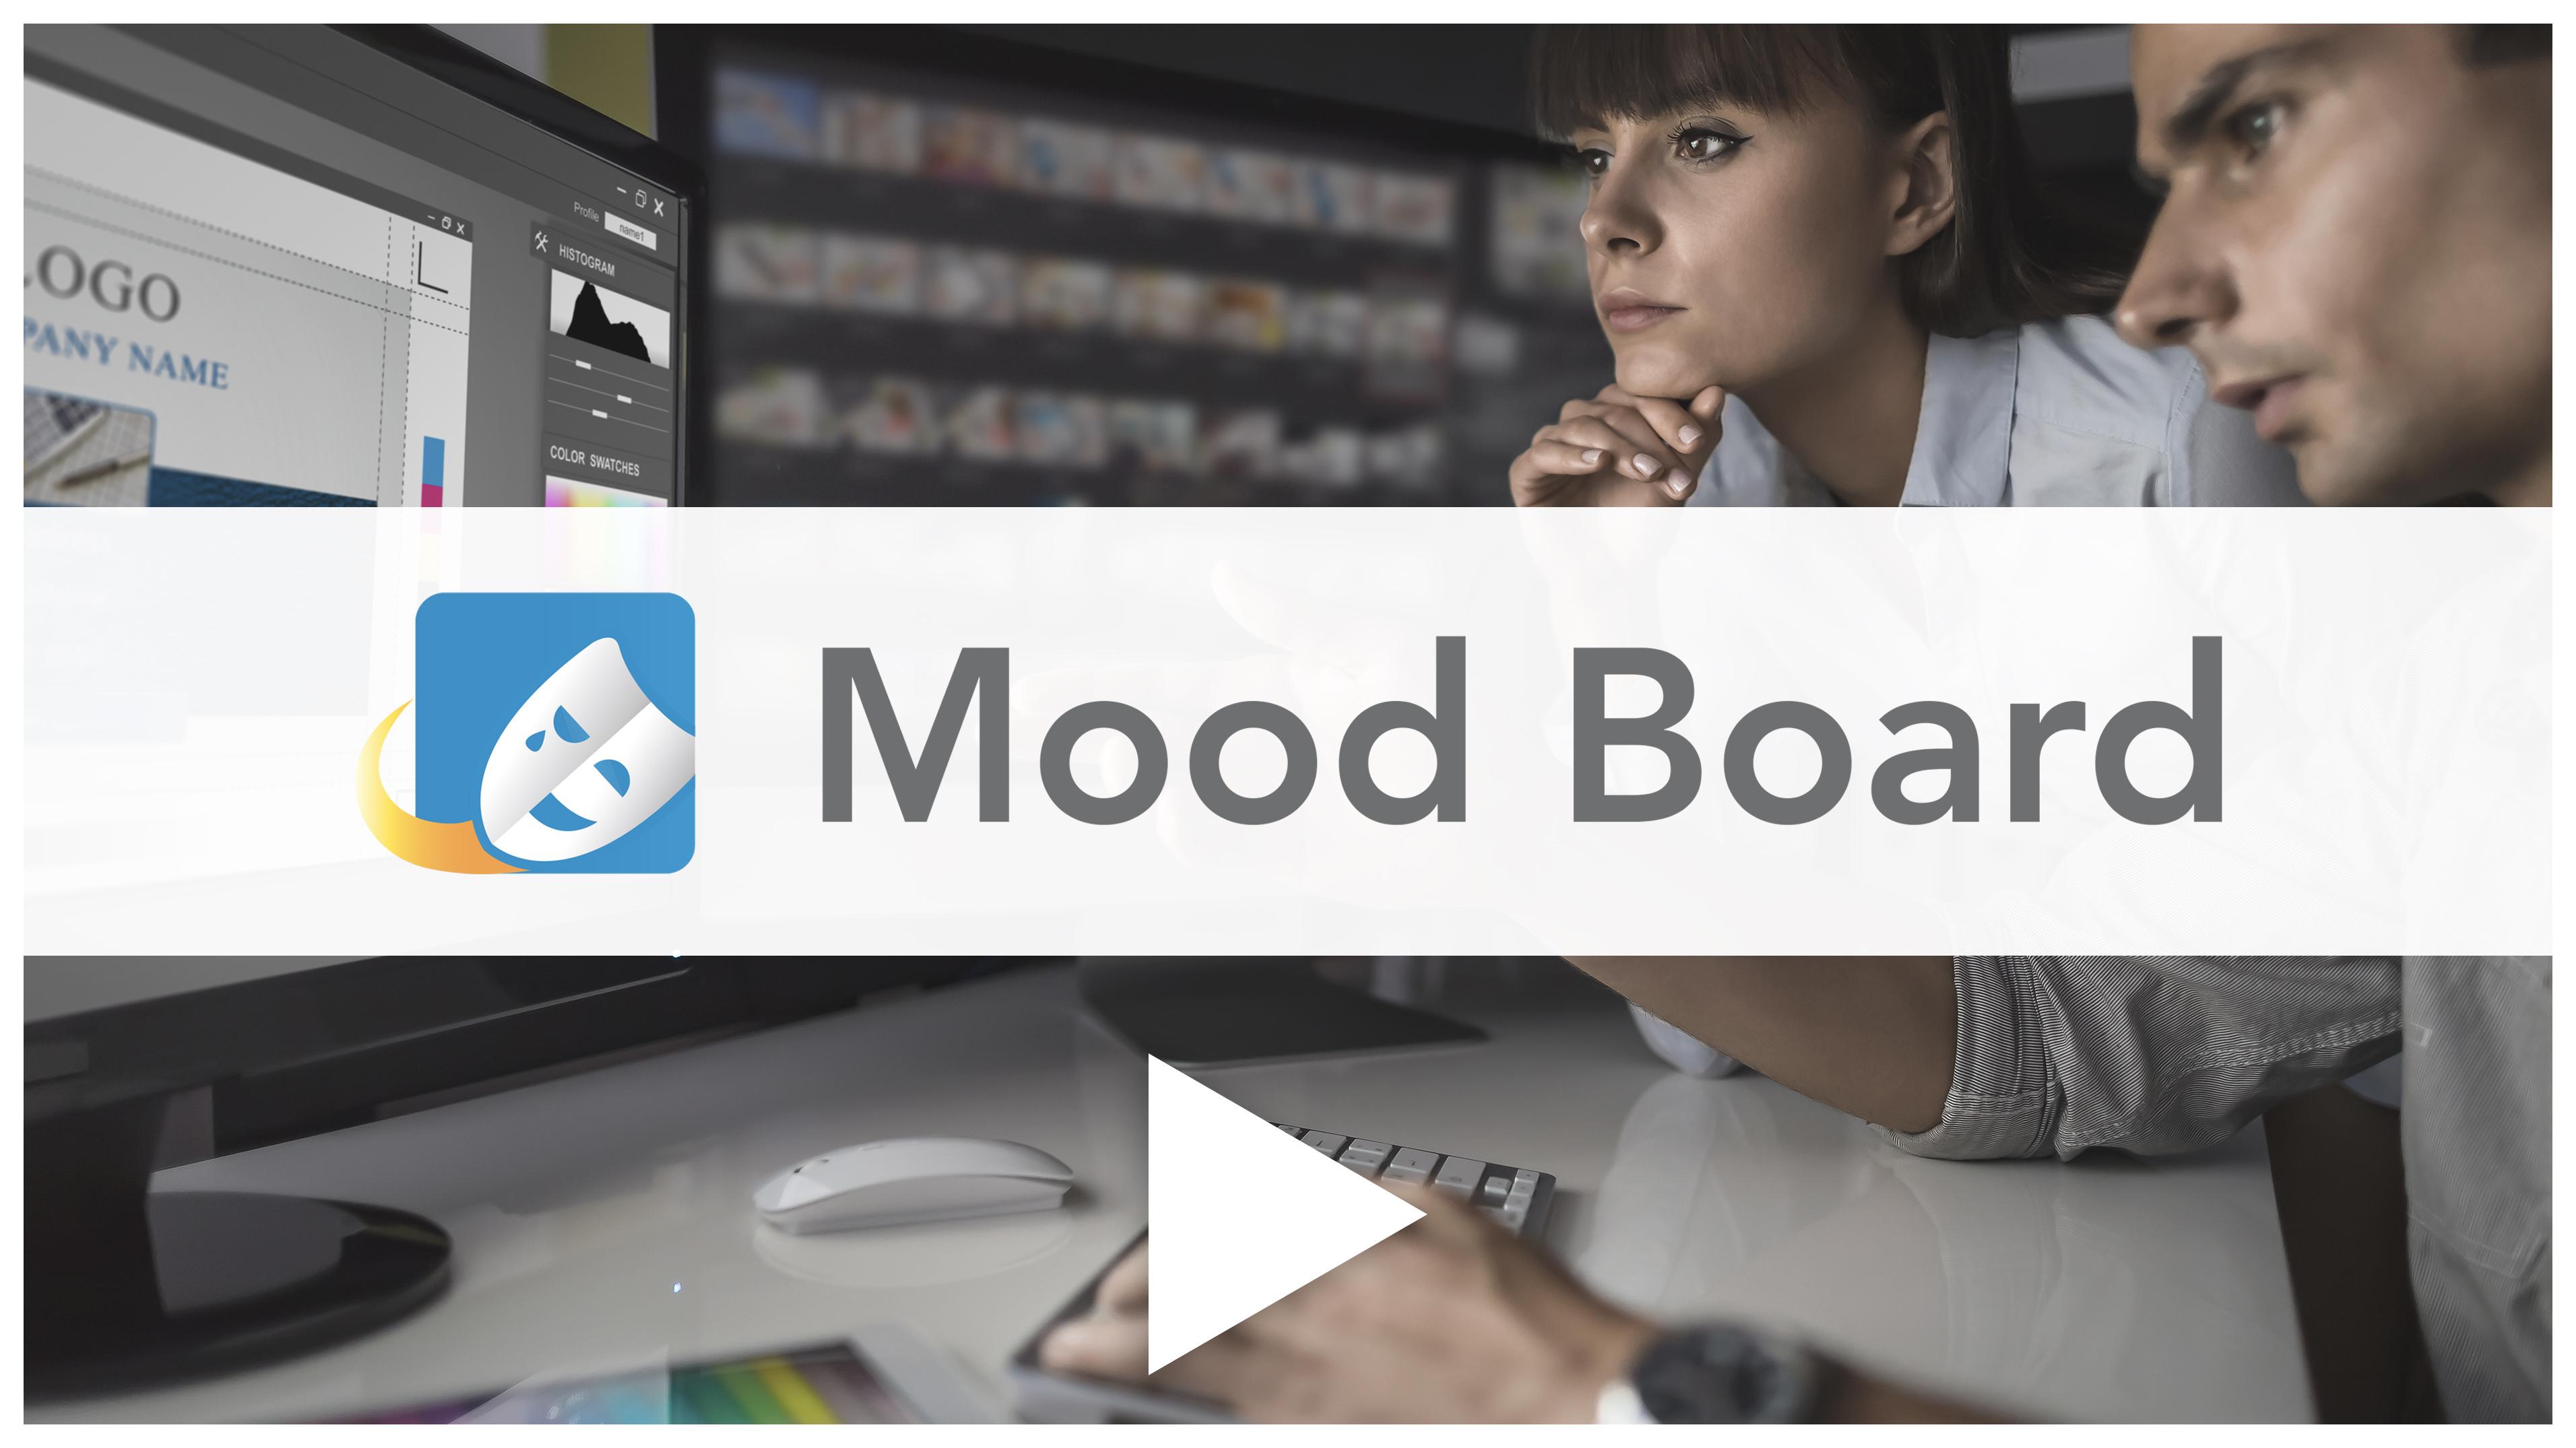 Mood Board Video